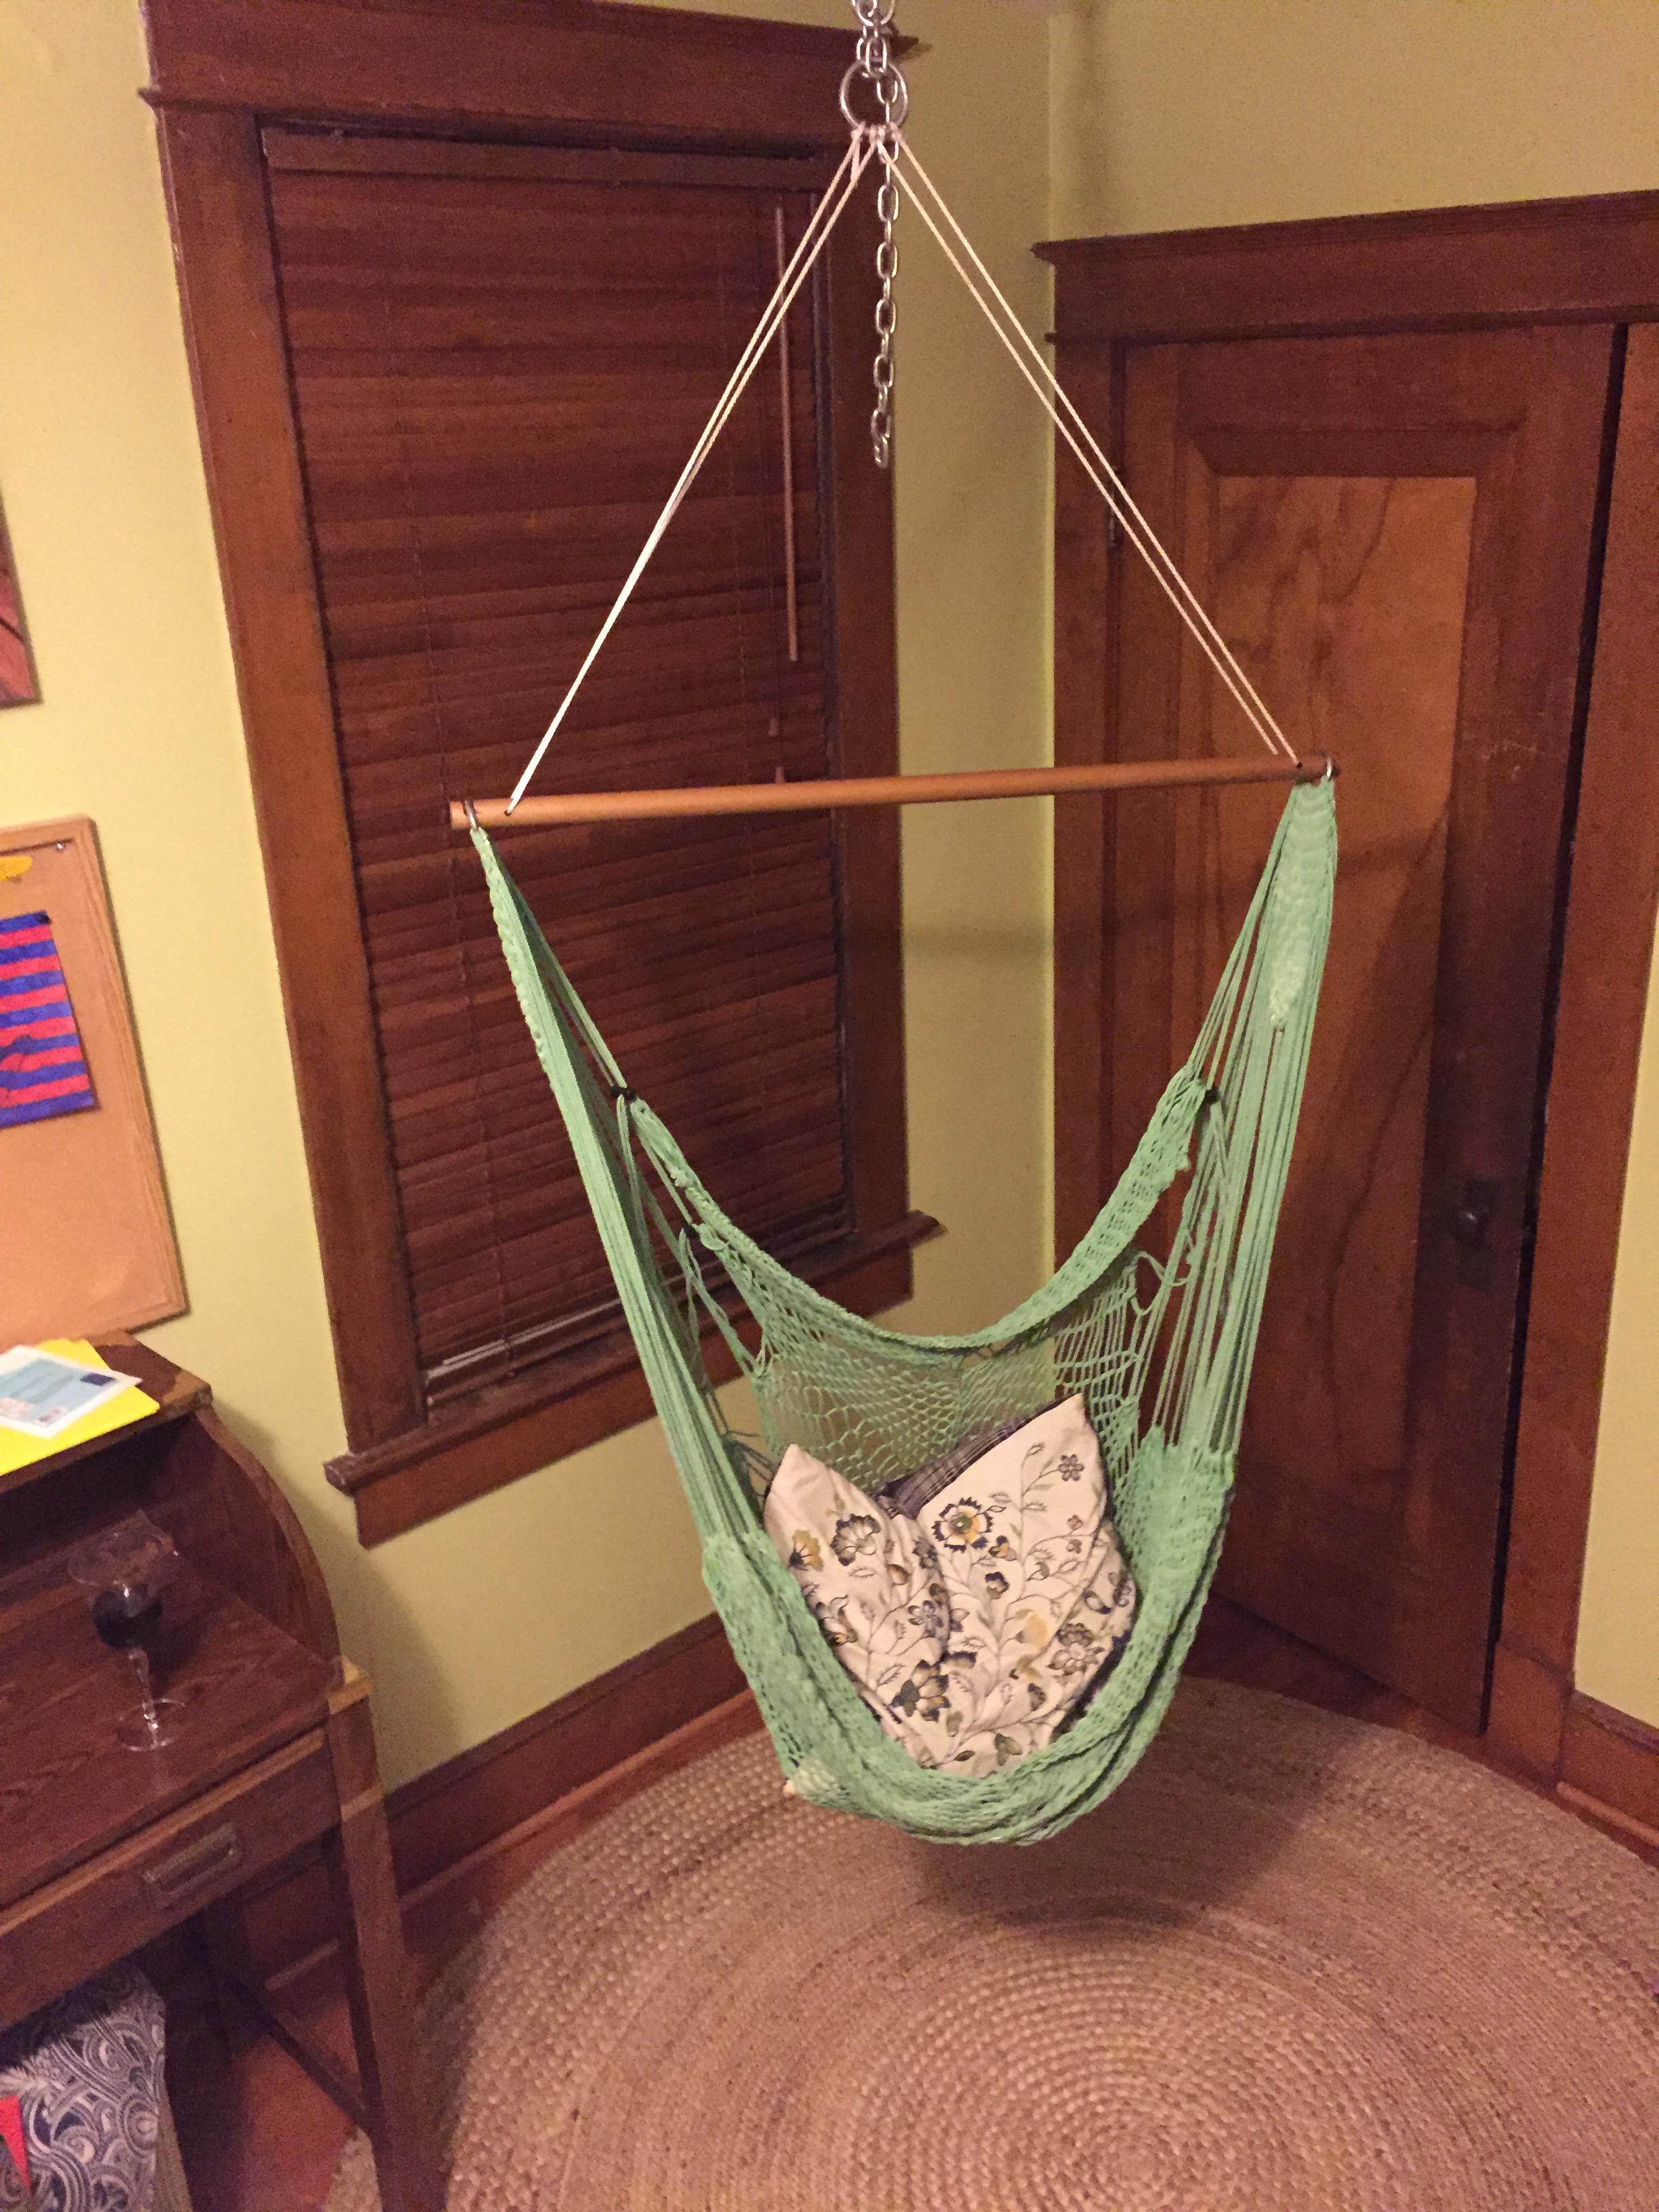 Hanging hammock chair.